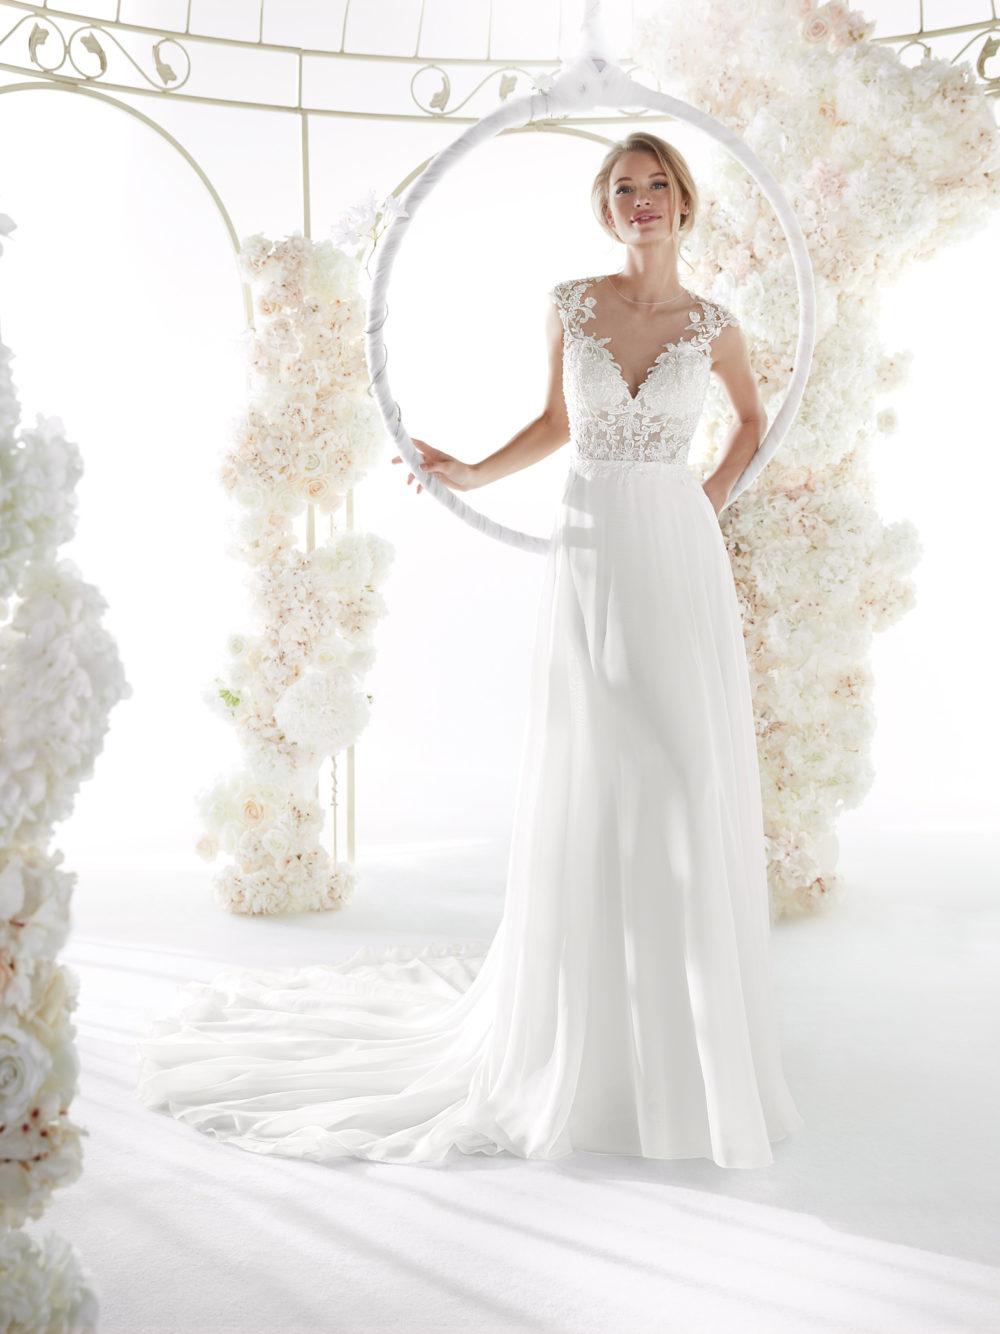 Mariages: abito da sposa Colet 2020 a Vicenza, Verona, Padova, Veneto COA20221